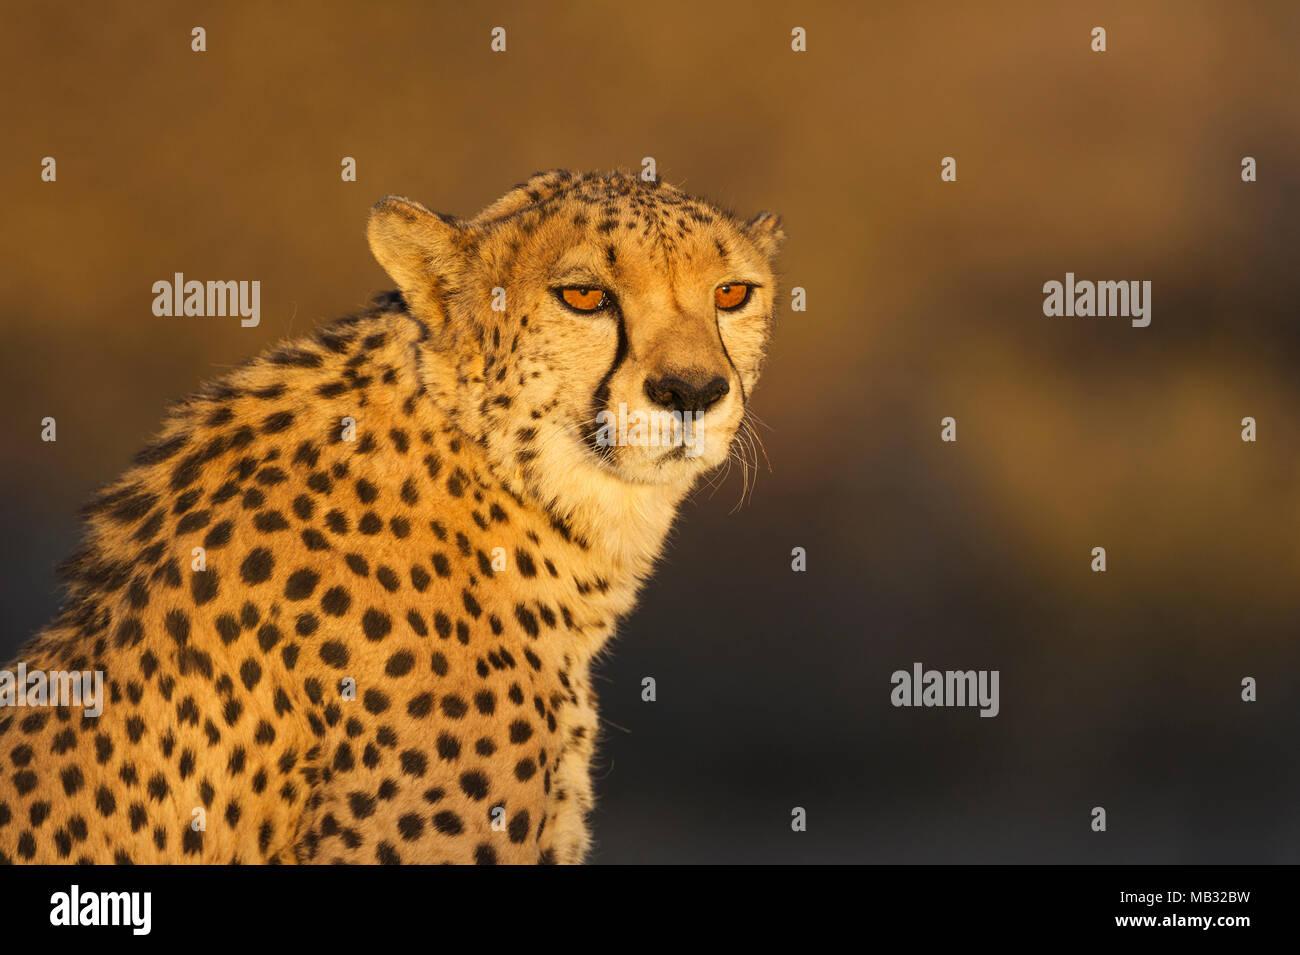 Cheetah (Acinonyx jubatus), male, animal portrait, in the evening light, captive, Namibia - Stock Image